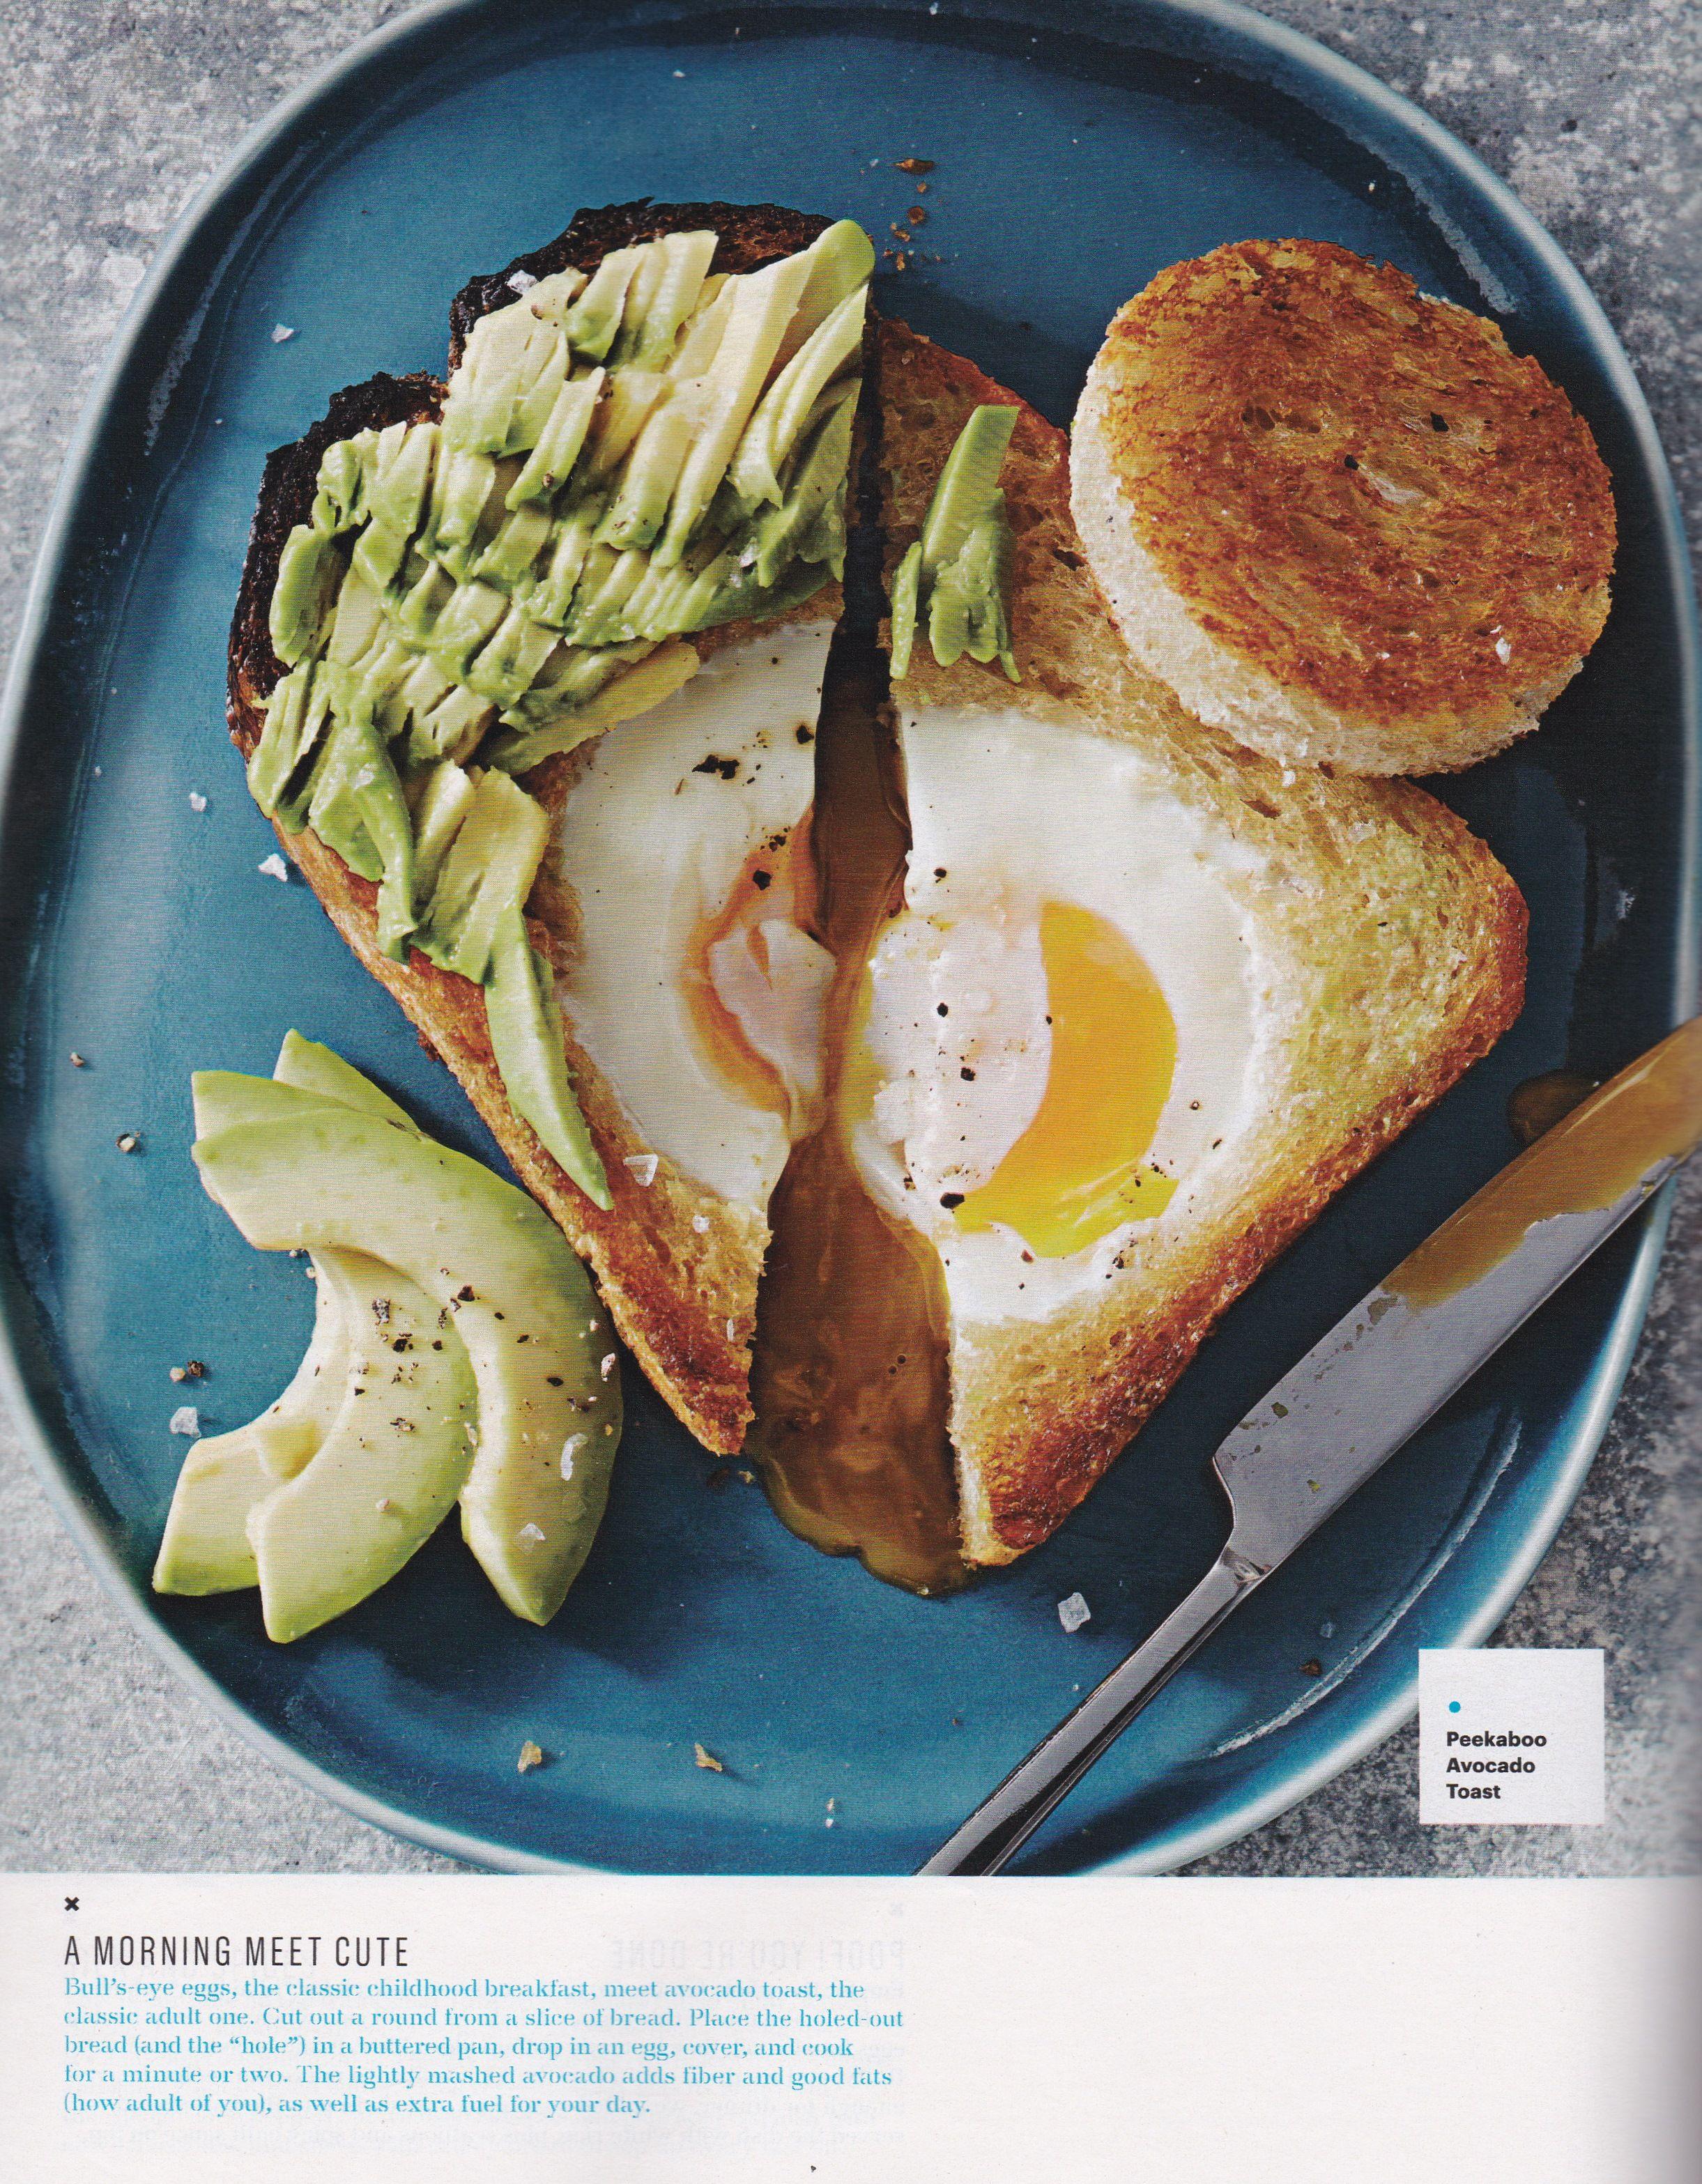 Peekaboo Avocado Toast photo recipe Martha Stewart